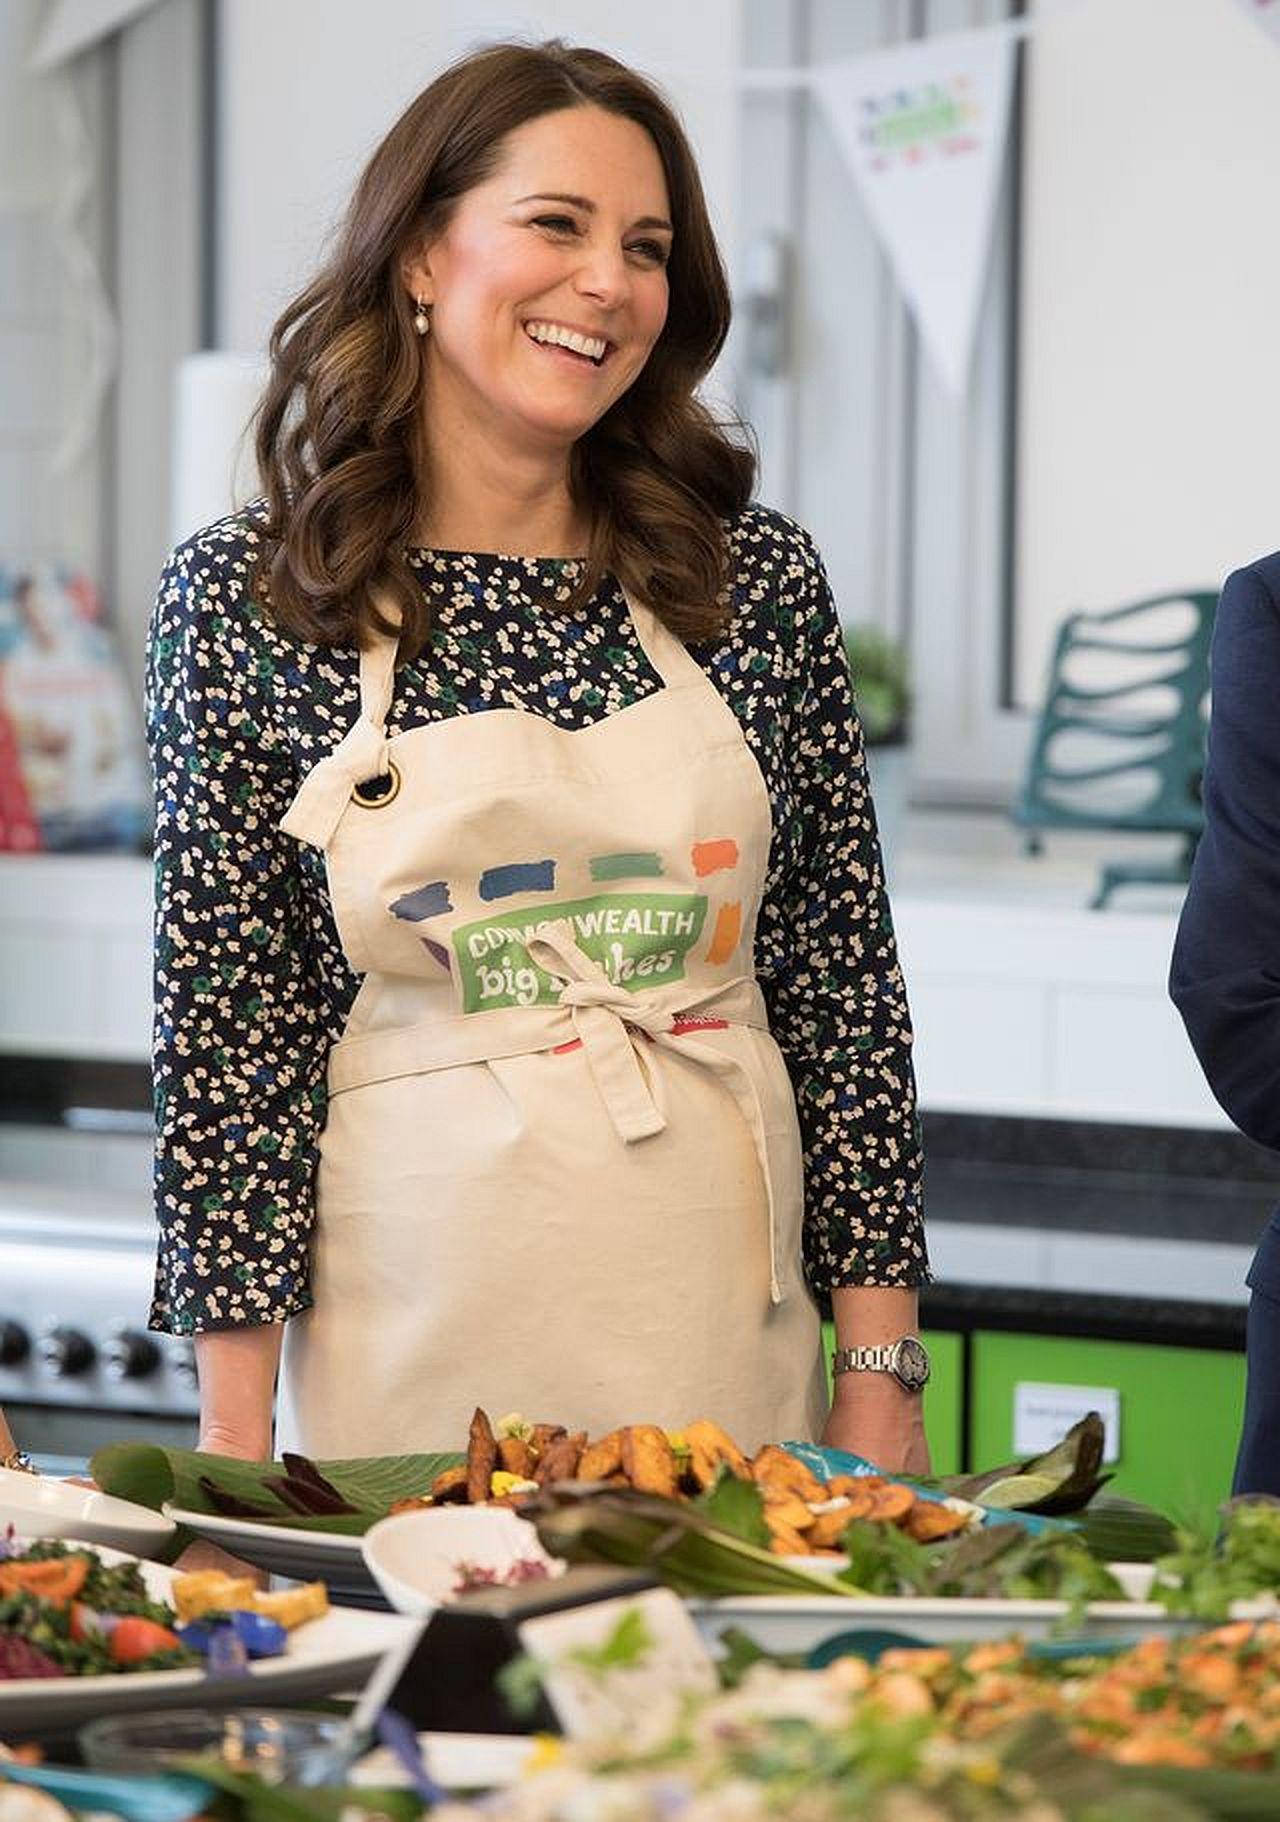 Księżna Kate podczas gotowania